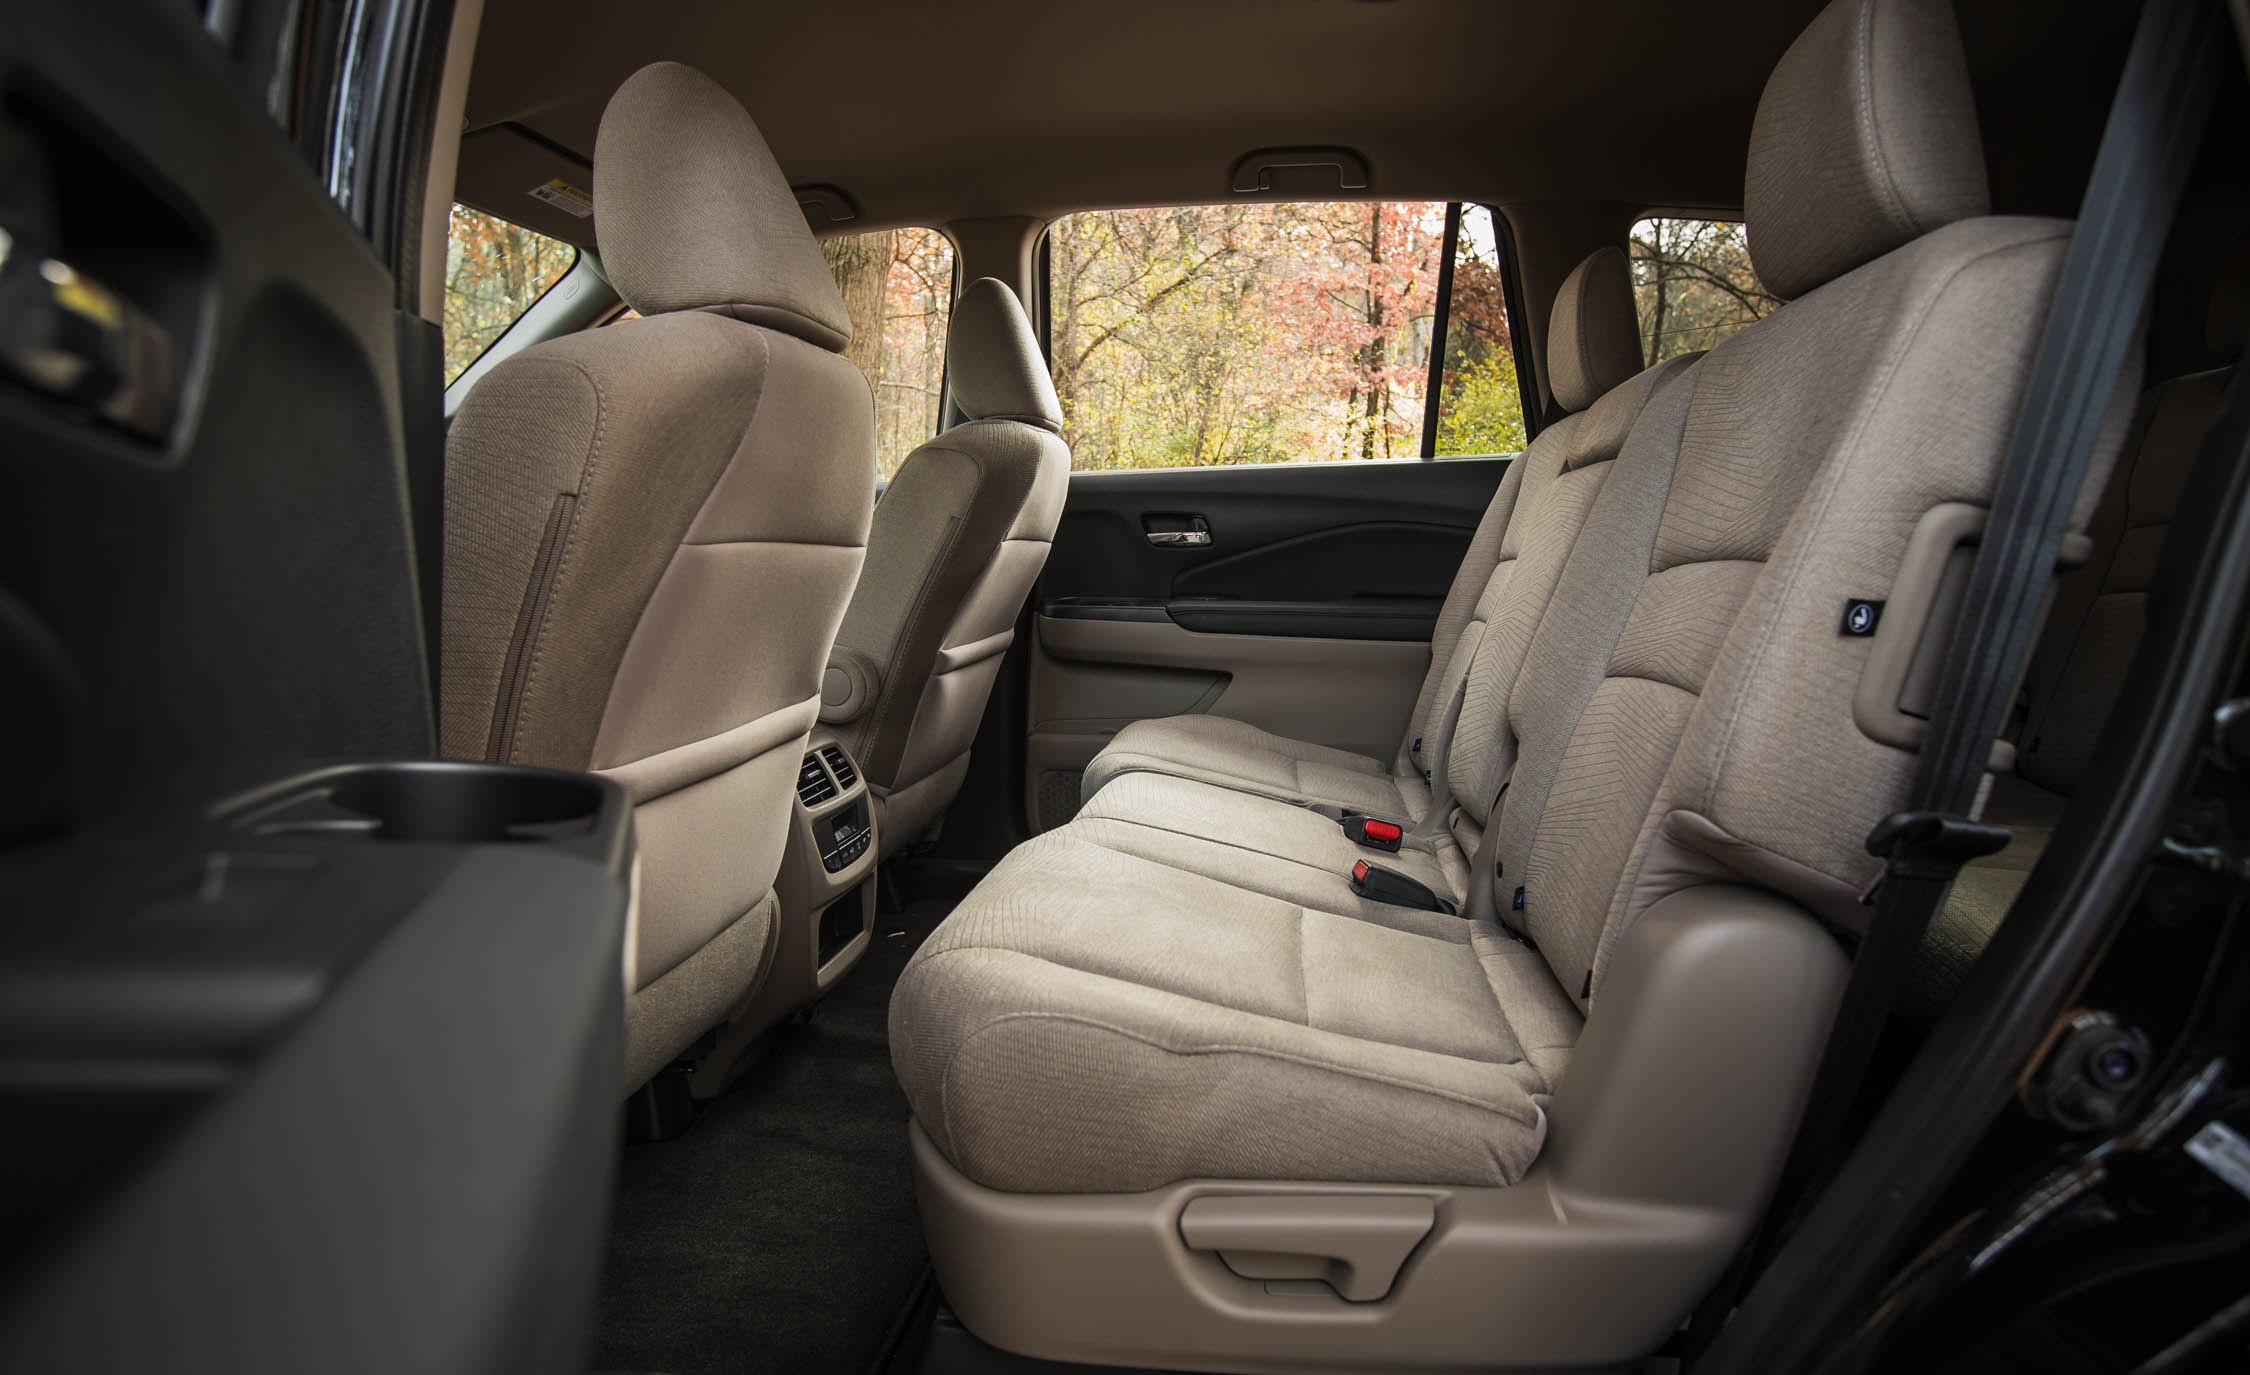 2016 honda pilot ex fwd interior 2nd row 9007 cars. Black Bedroom Furniture Sets. Home Design Ideas